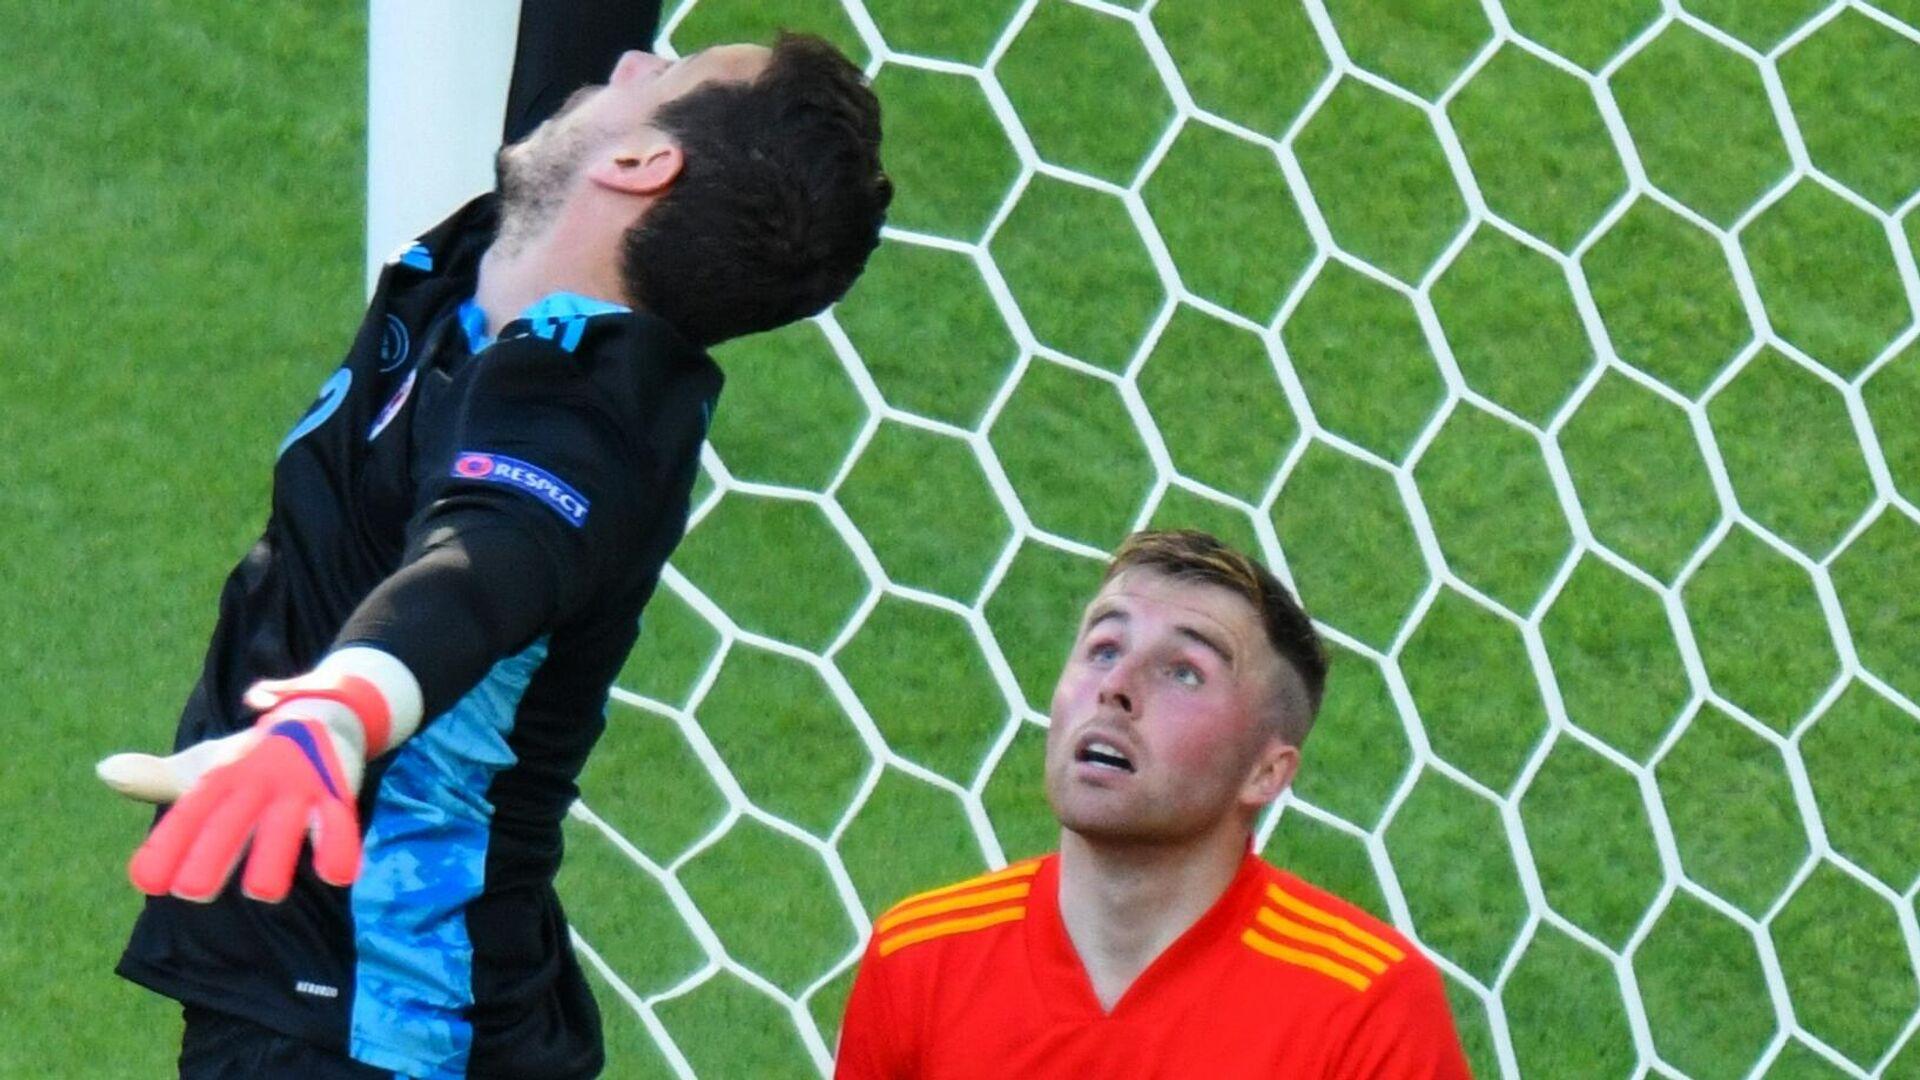 Galles, Euro 2020 - Sputnik Italia, 1920, 20.06.2021